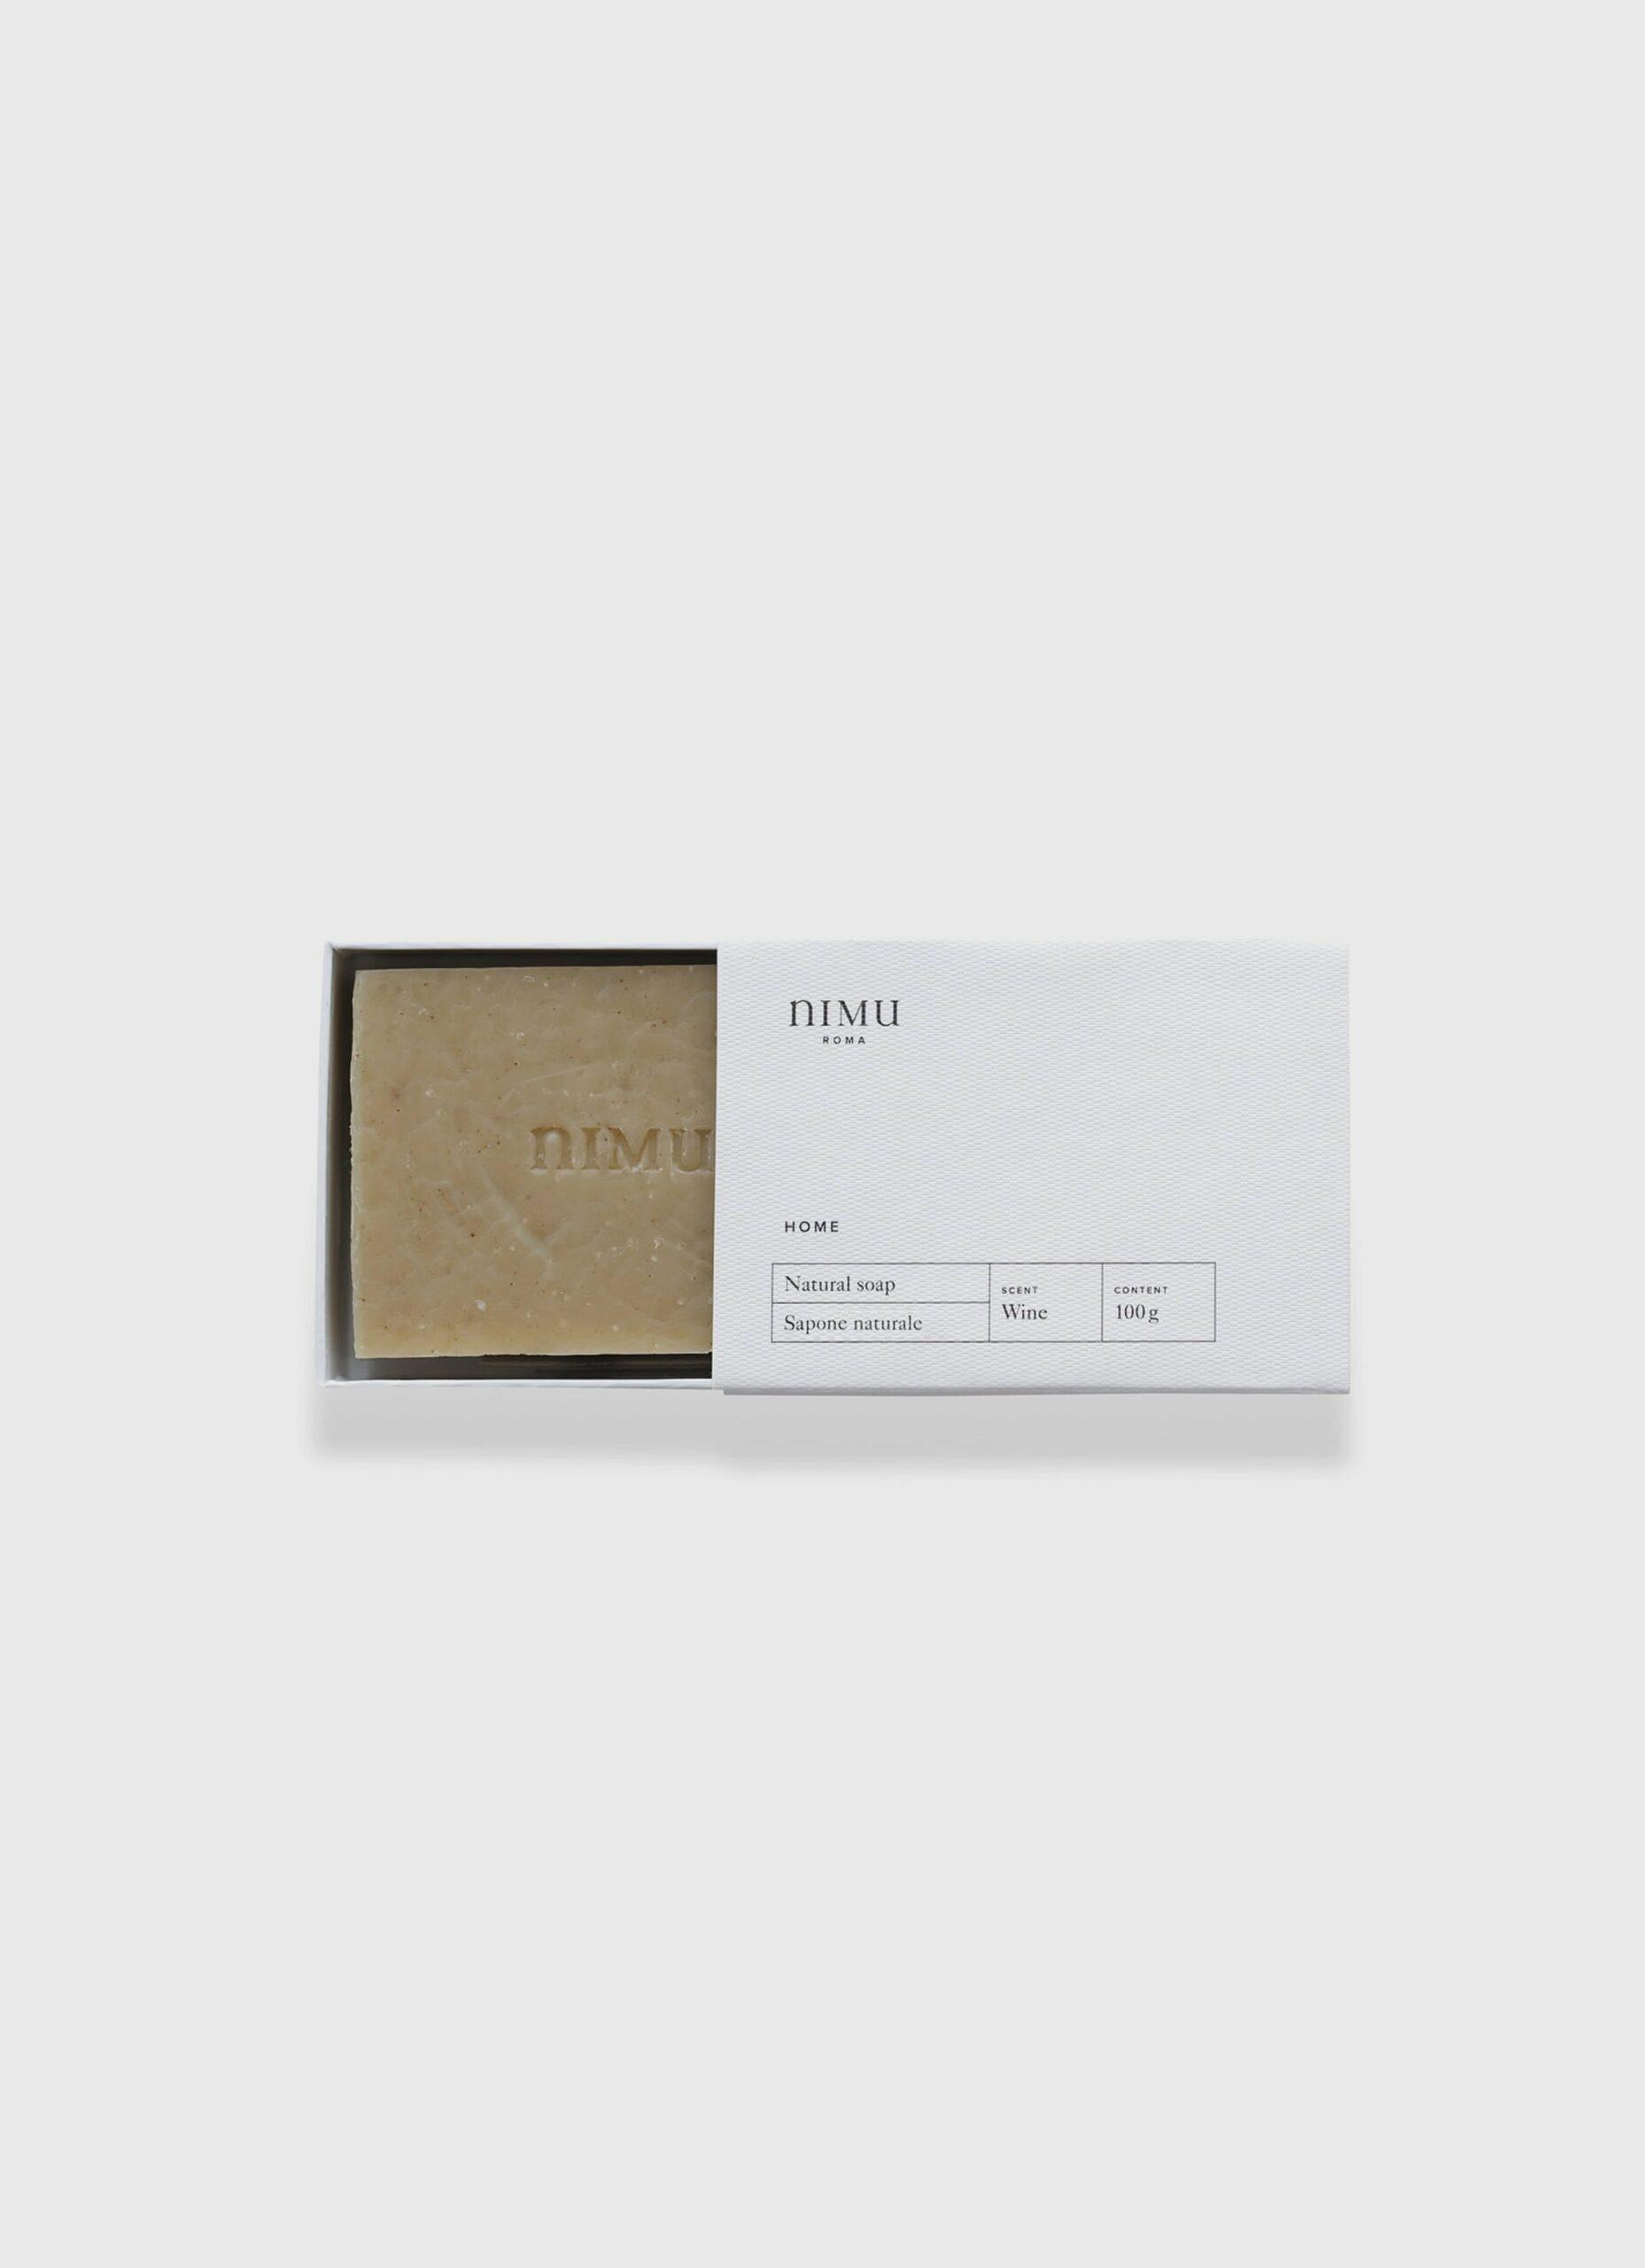 Nimu Roma - Wine - handmade natural soap